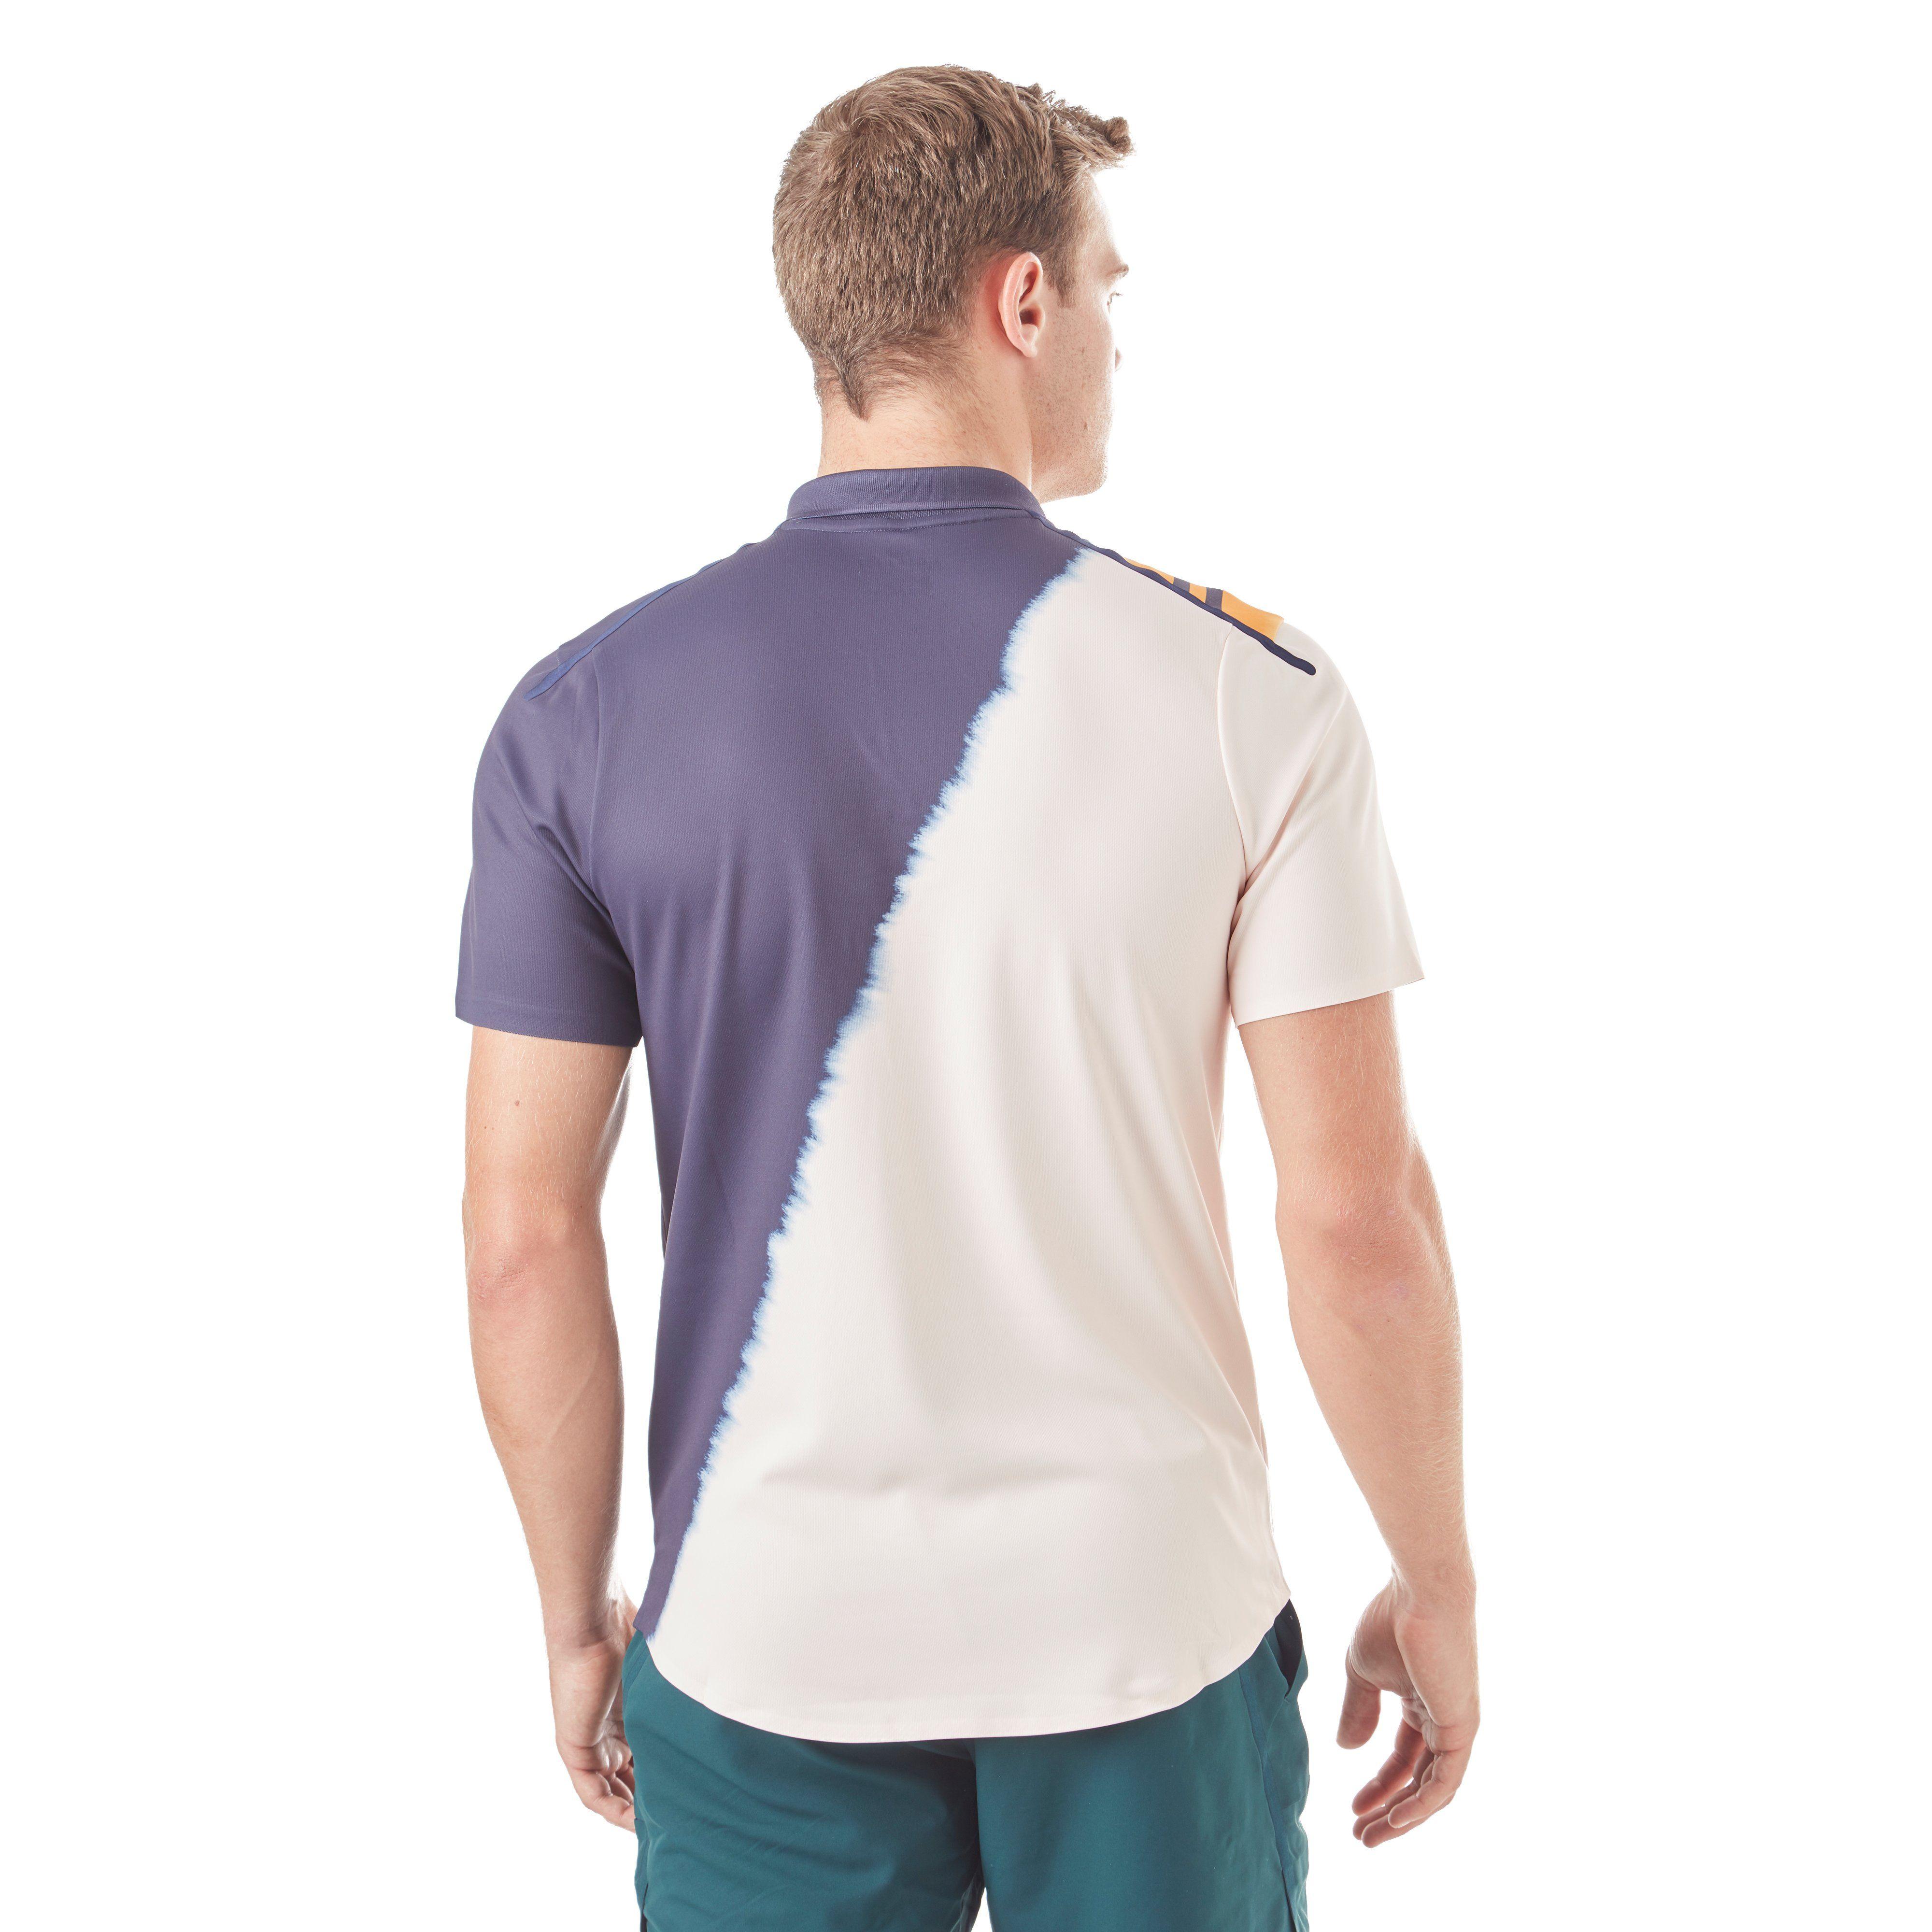 Nike Court Advantage Men's Tennis Polo Shirt